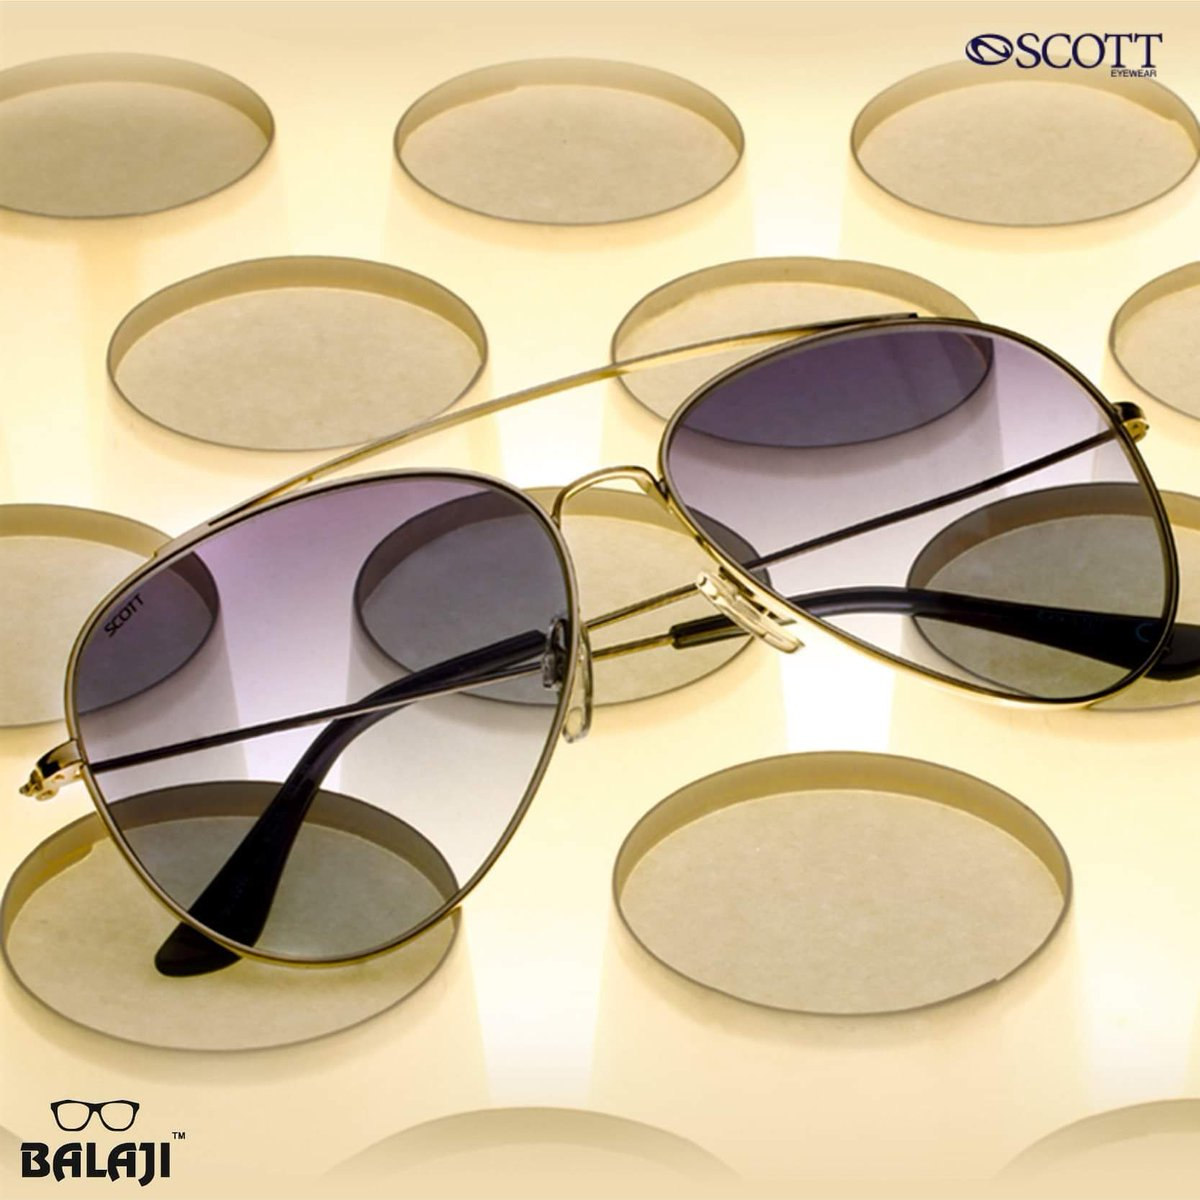 Let the light guide you to your favourite pair of #scottsunnies.   #ISeeYou #SpringSummerCollection #Sunglasses #ScottEyewear #Style #FashionEyewear #DesignerEyewear #LatestCollection #ScottEyewearXAKSK #SonamKapoor #AnilKapoor #summer #BalajiOpticalCo. @Balajiopticalco